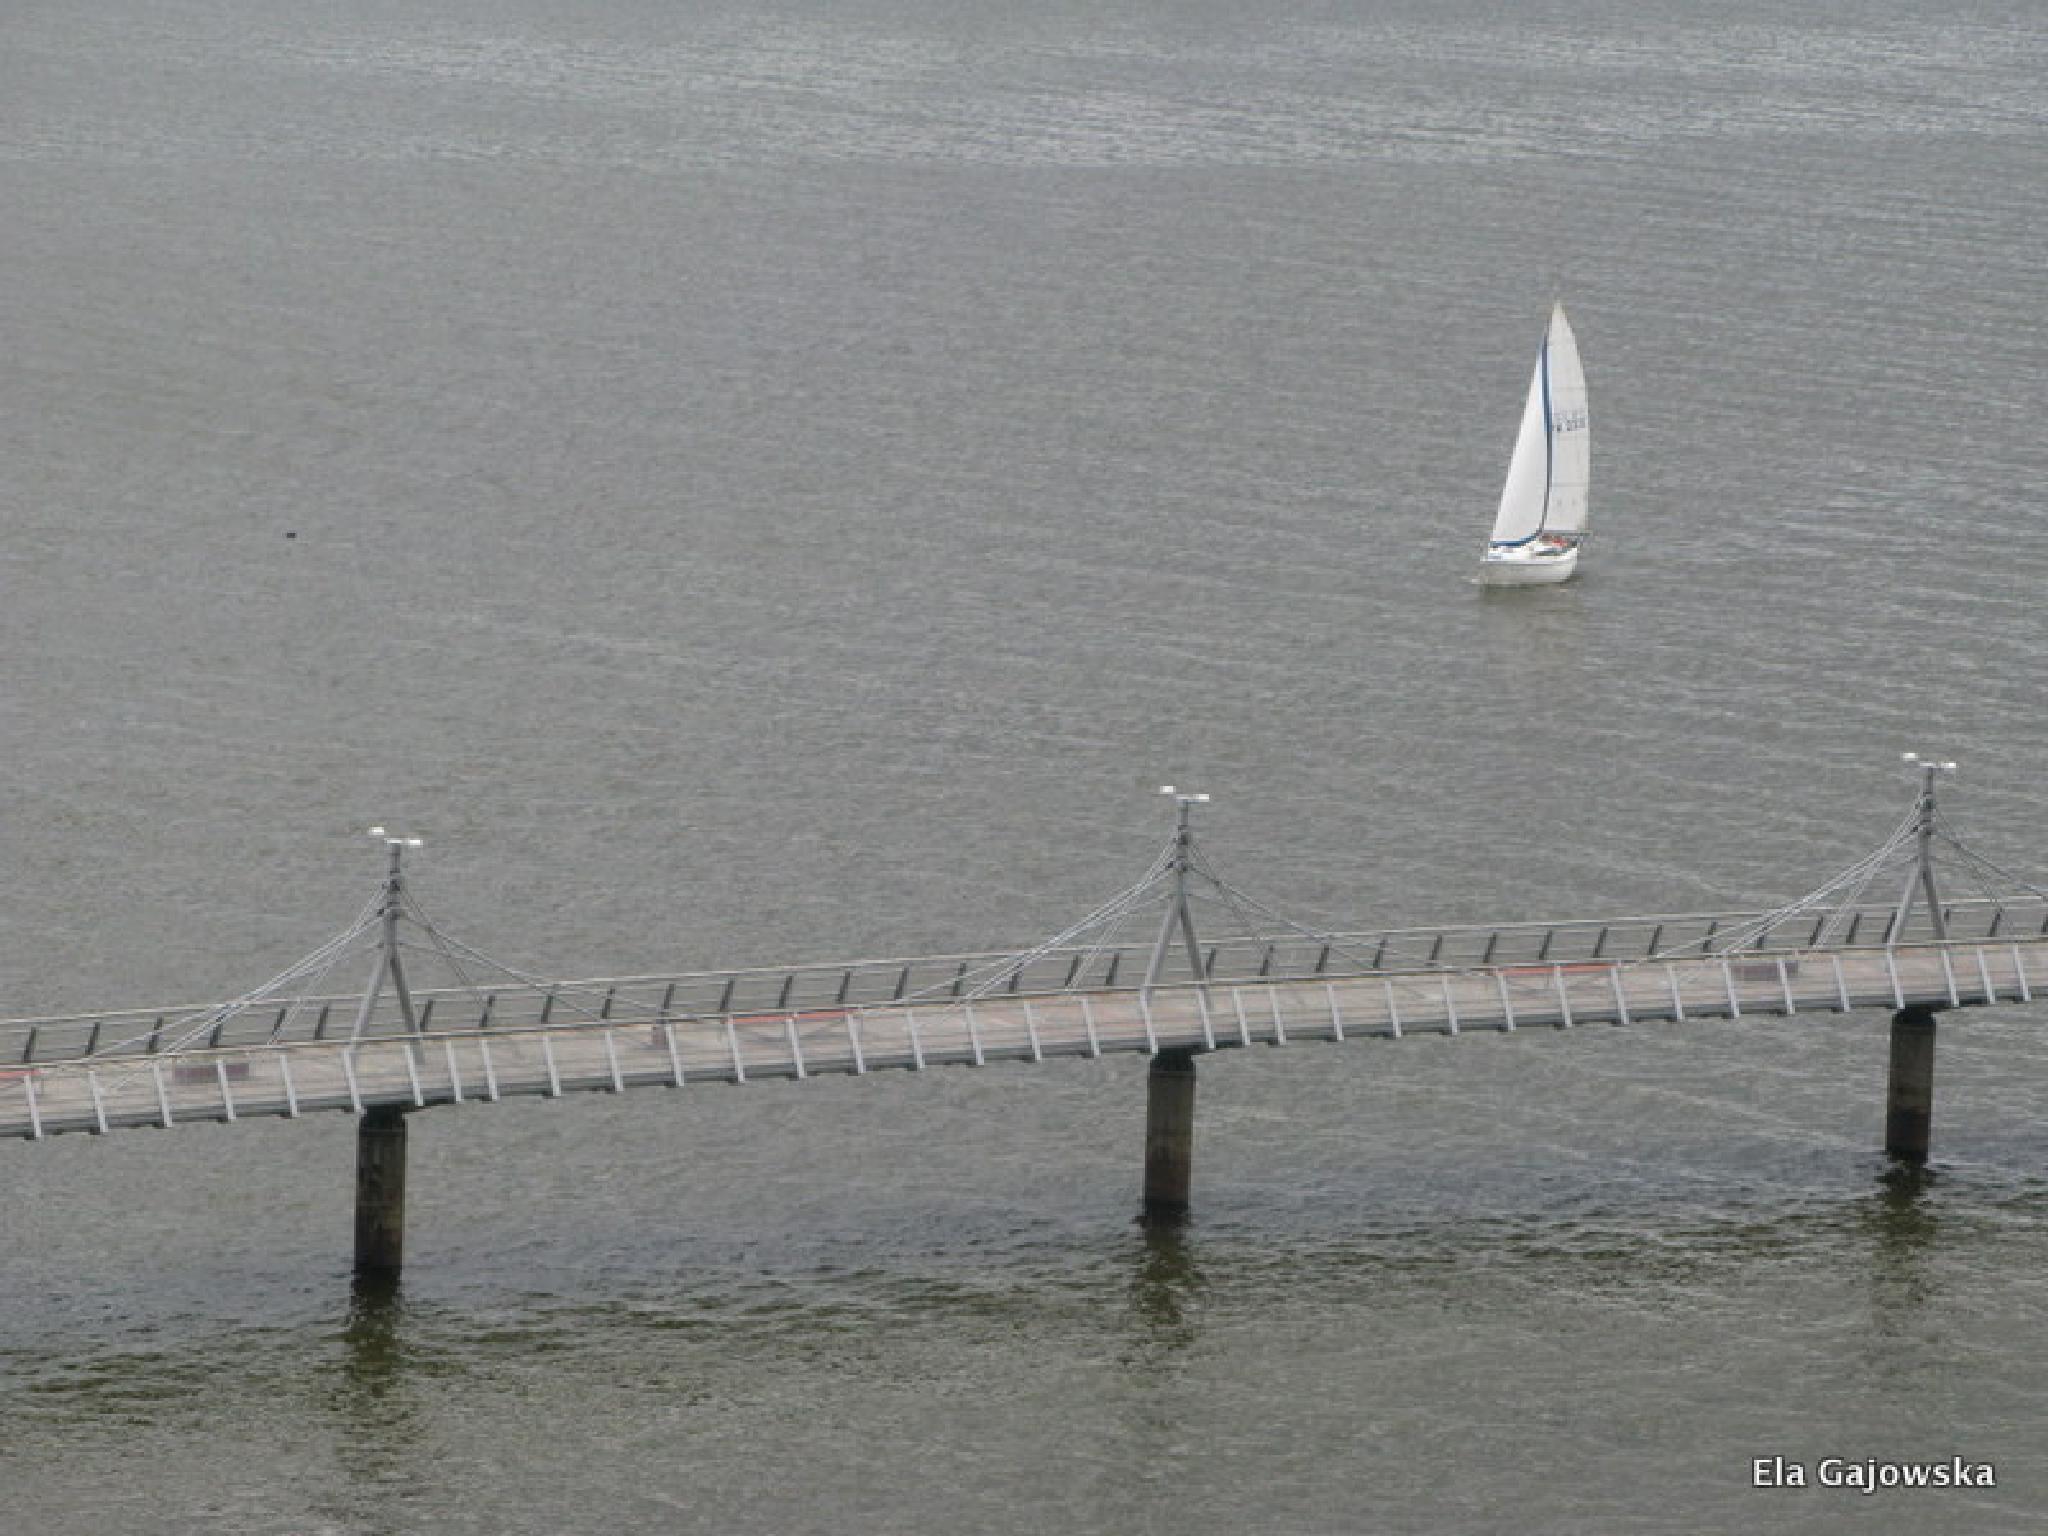 A grey day on the Vistula river 2 by Ela Gajowska